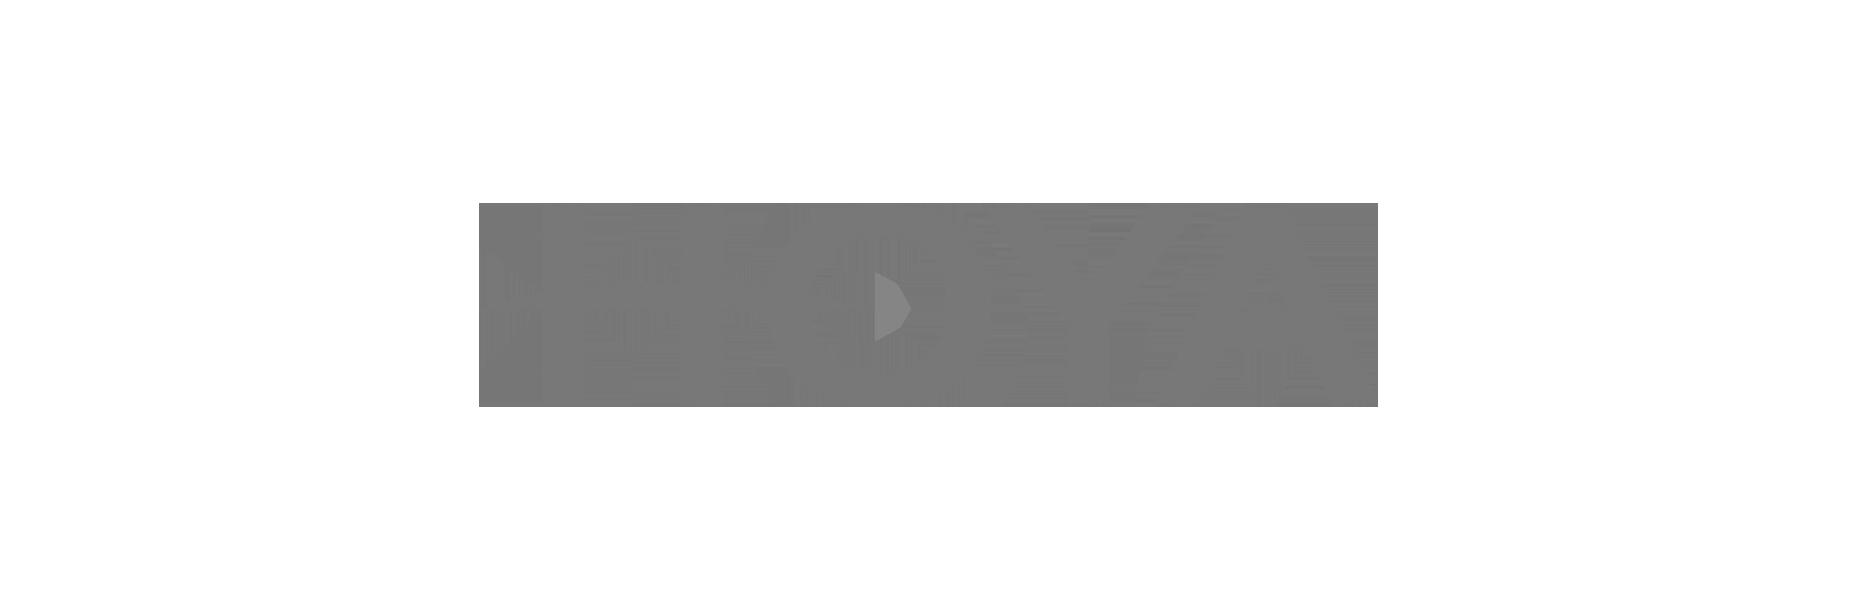 Hoya Ottica Bossi Trieste